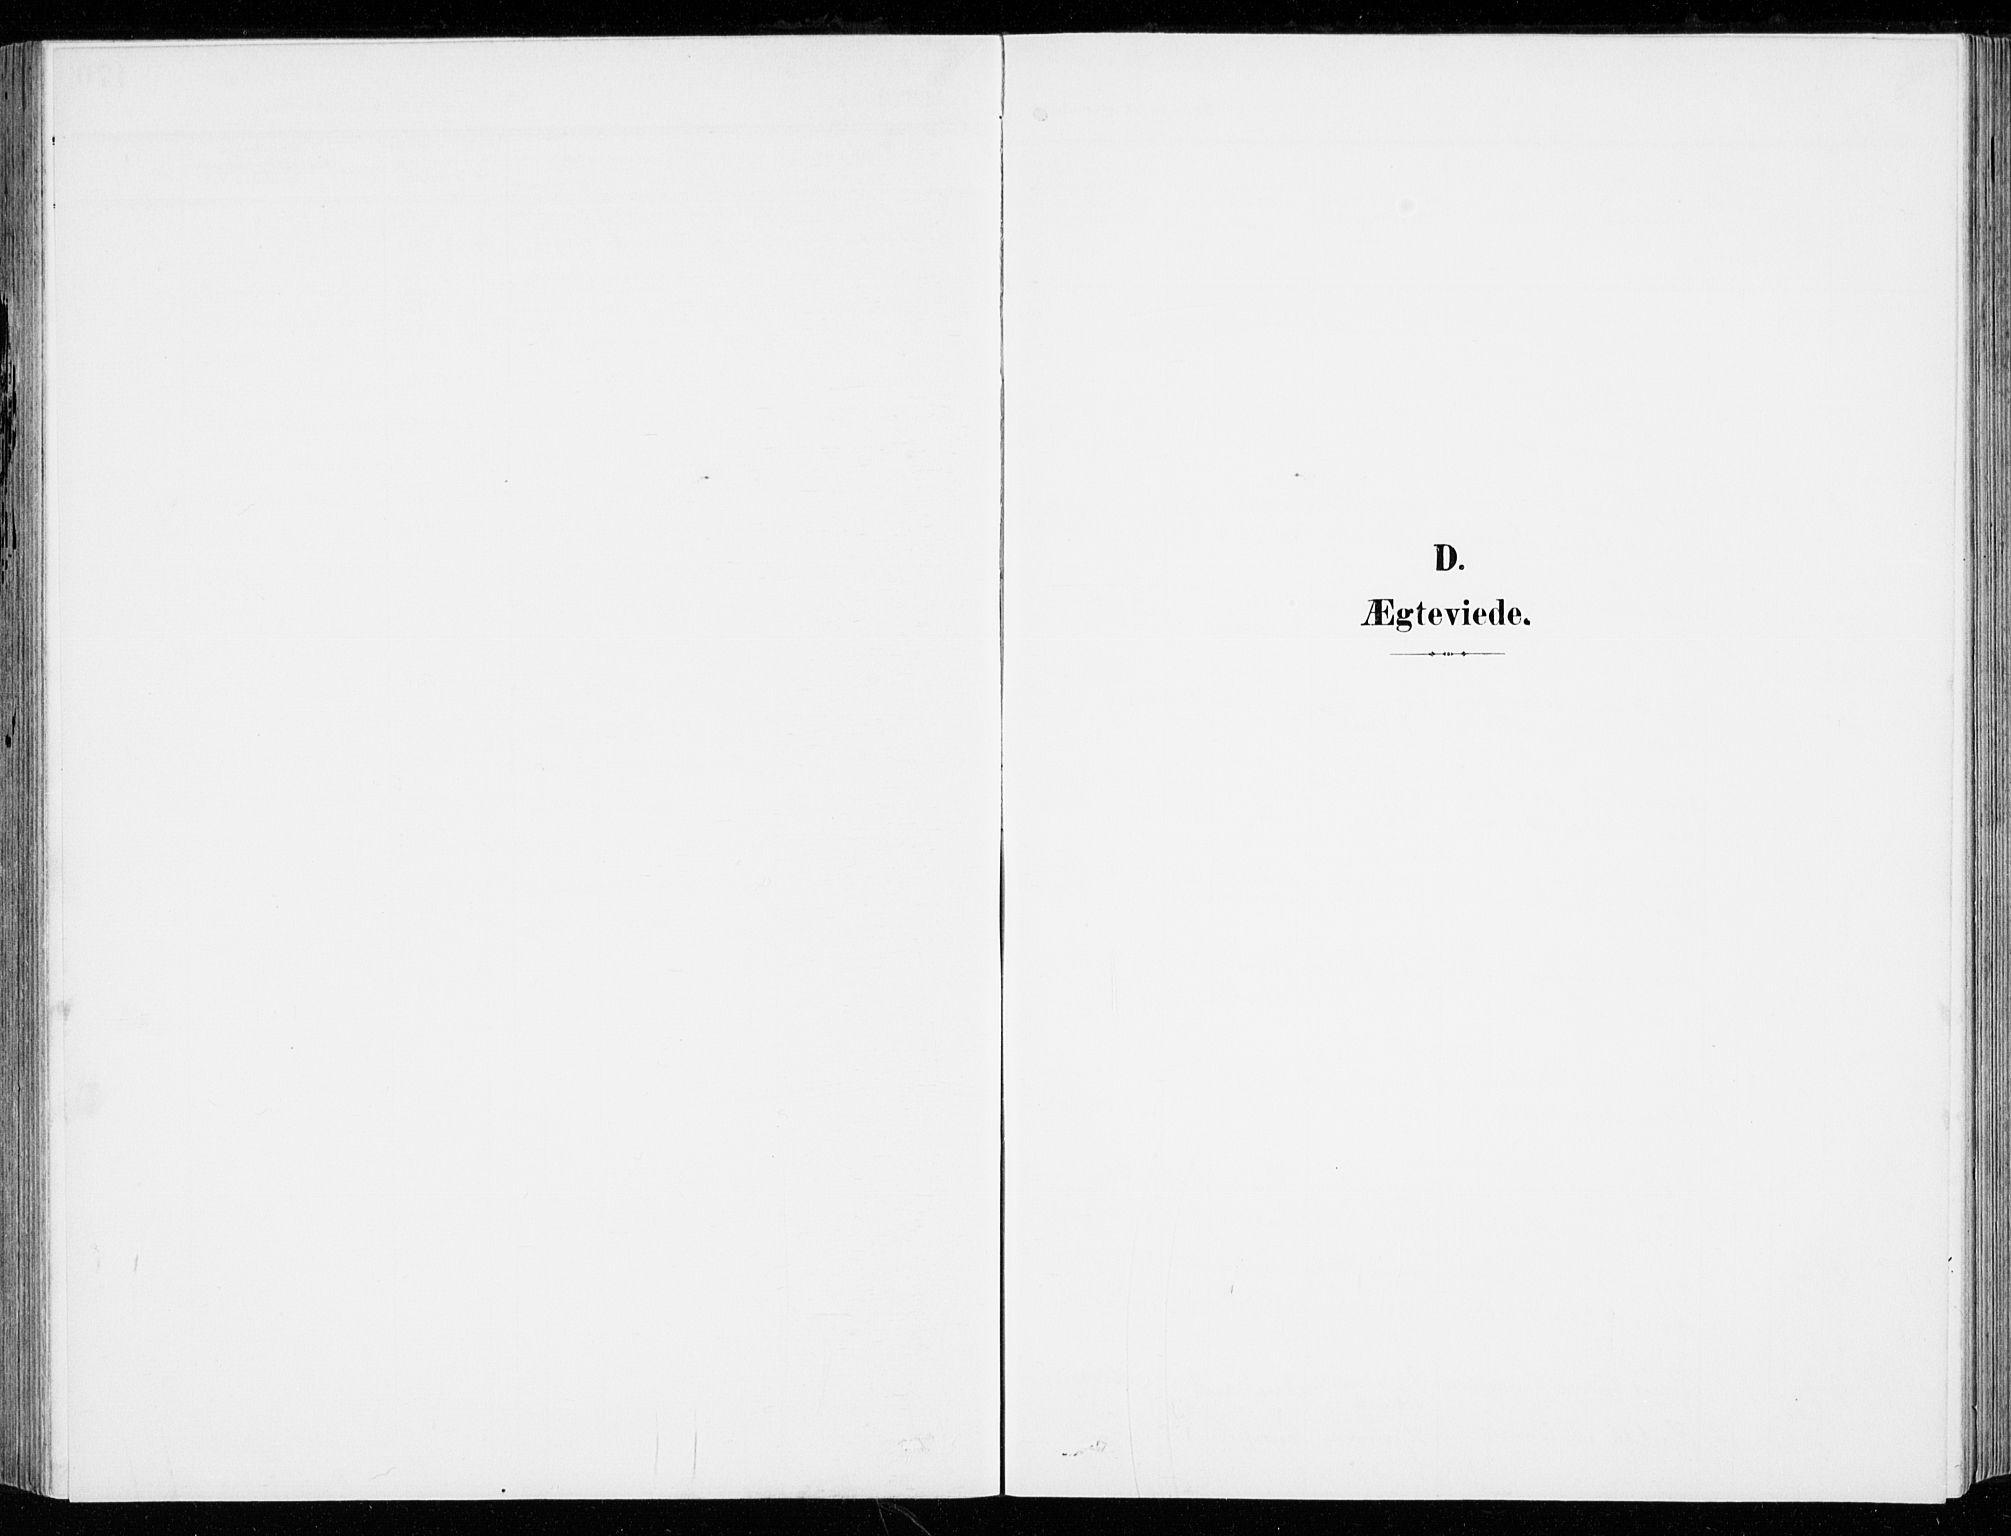 SAKO, Stokke kirkebøker, G/Ga/L0001: Klokkerbok nr. I 1, 1904-1940